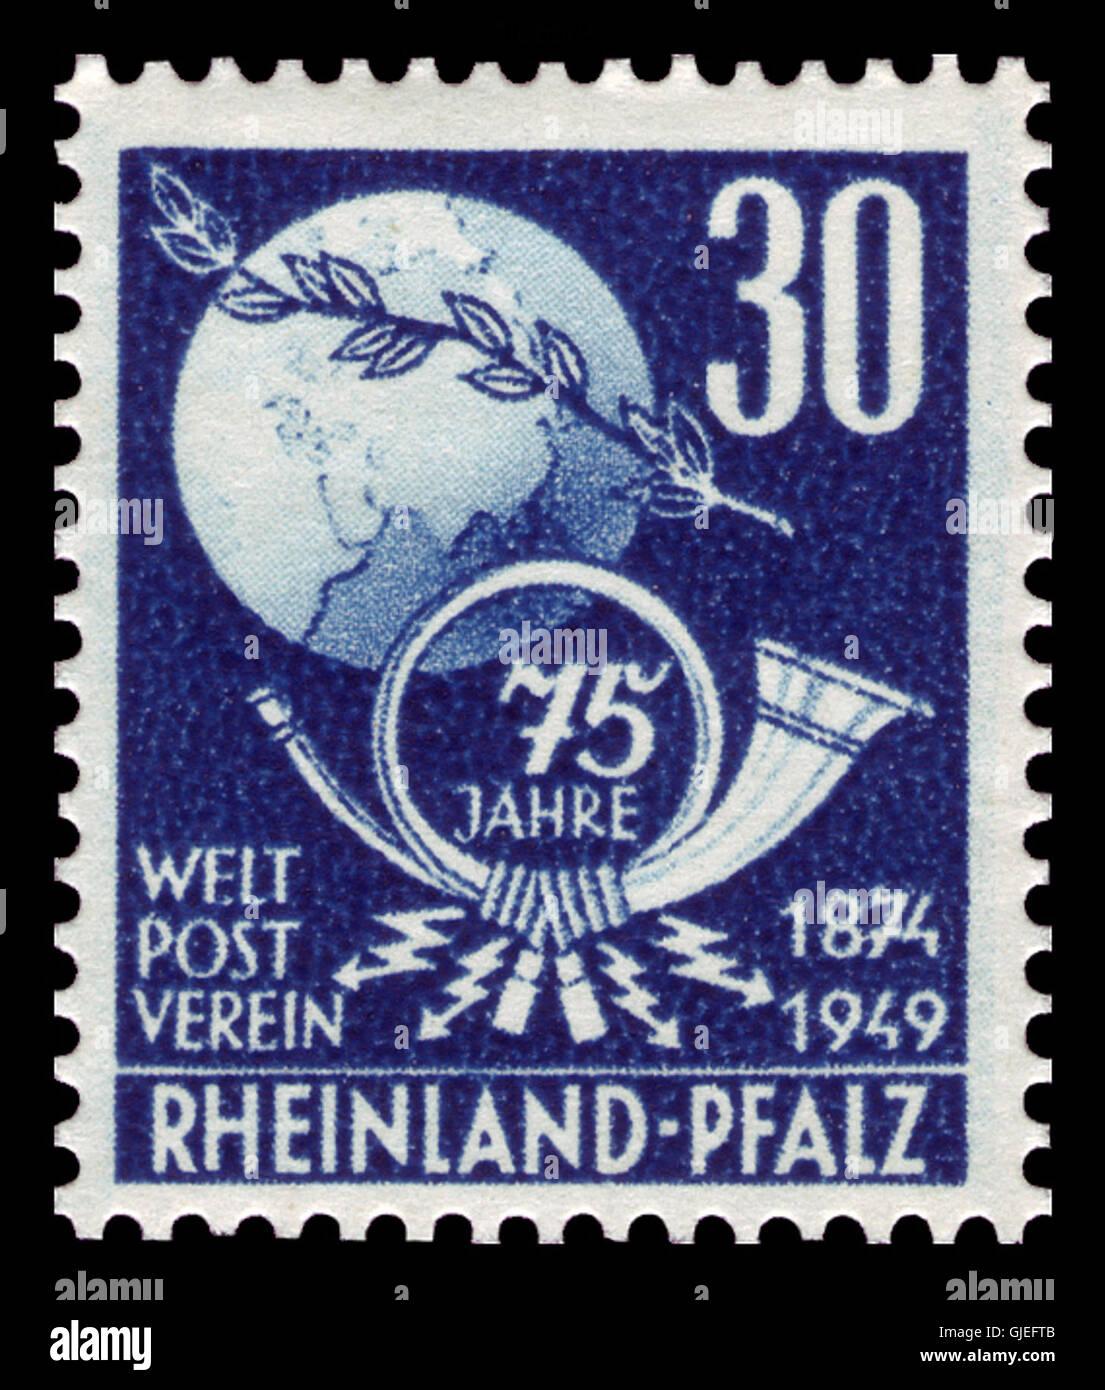 Fr. Zone Rheinland-Pfalz 1949 52 Weltpostverein Stock Photo